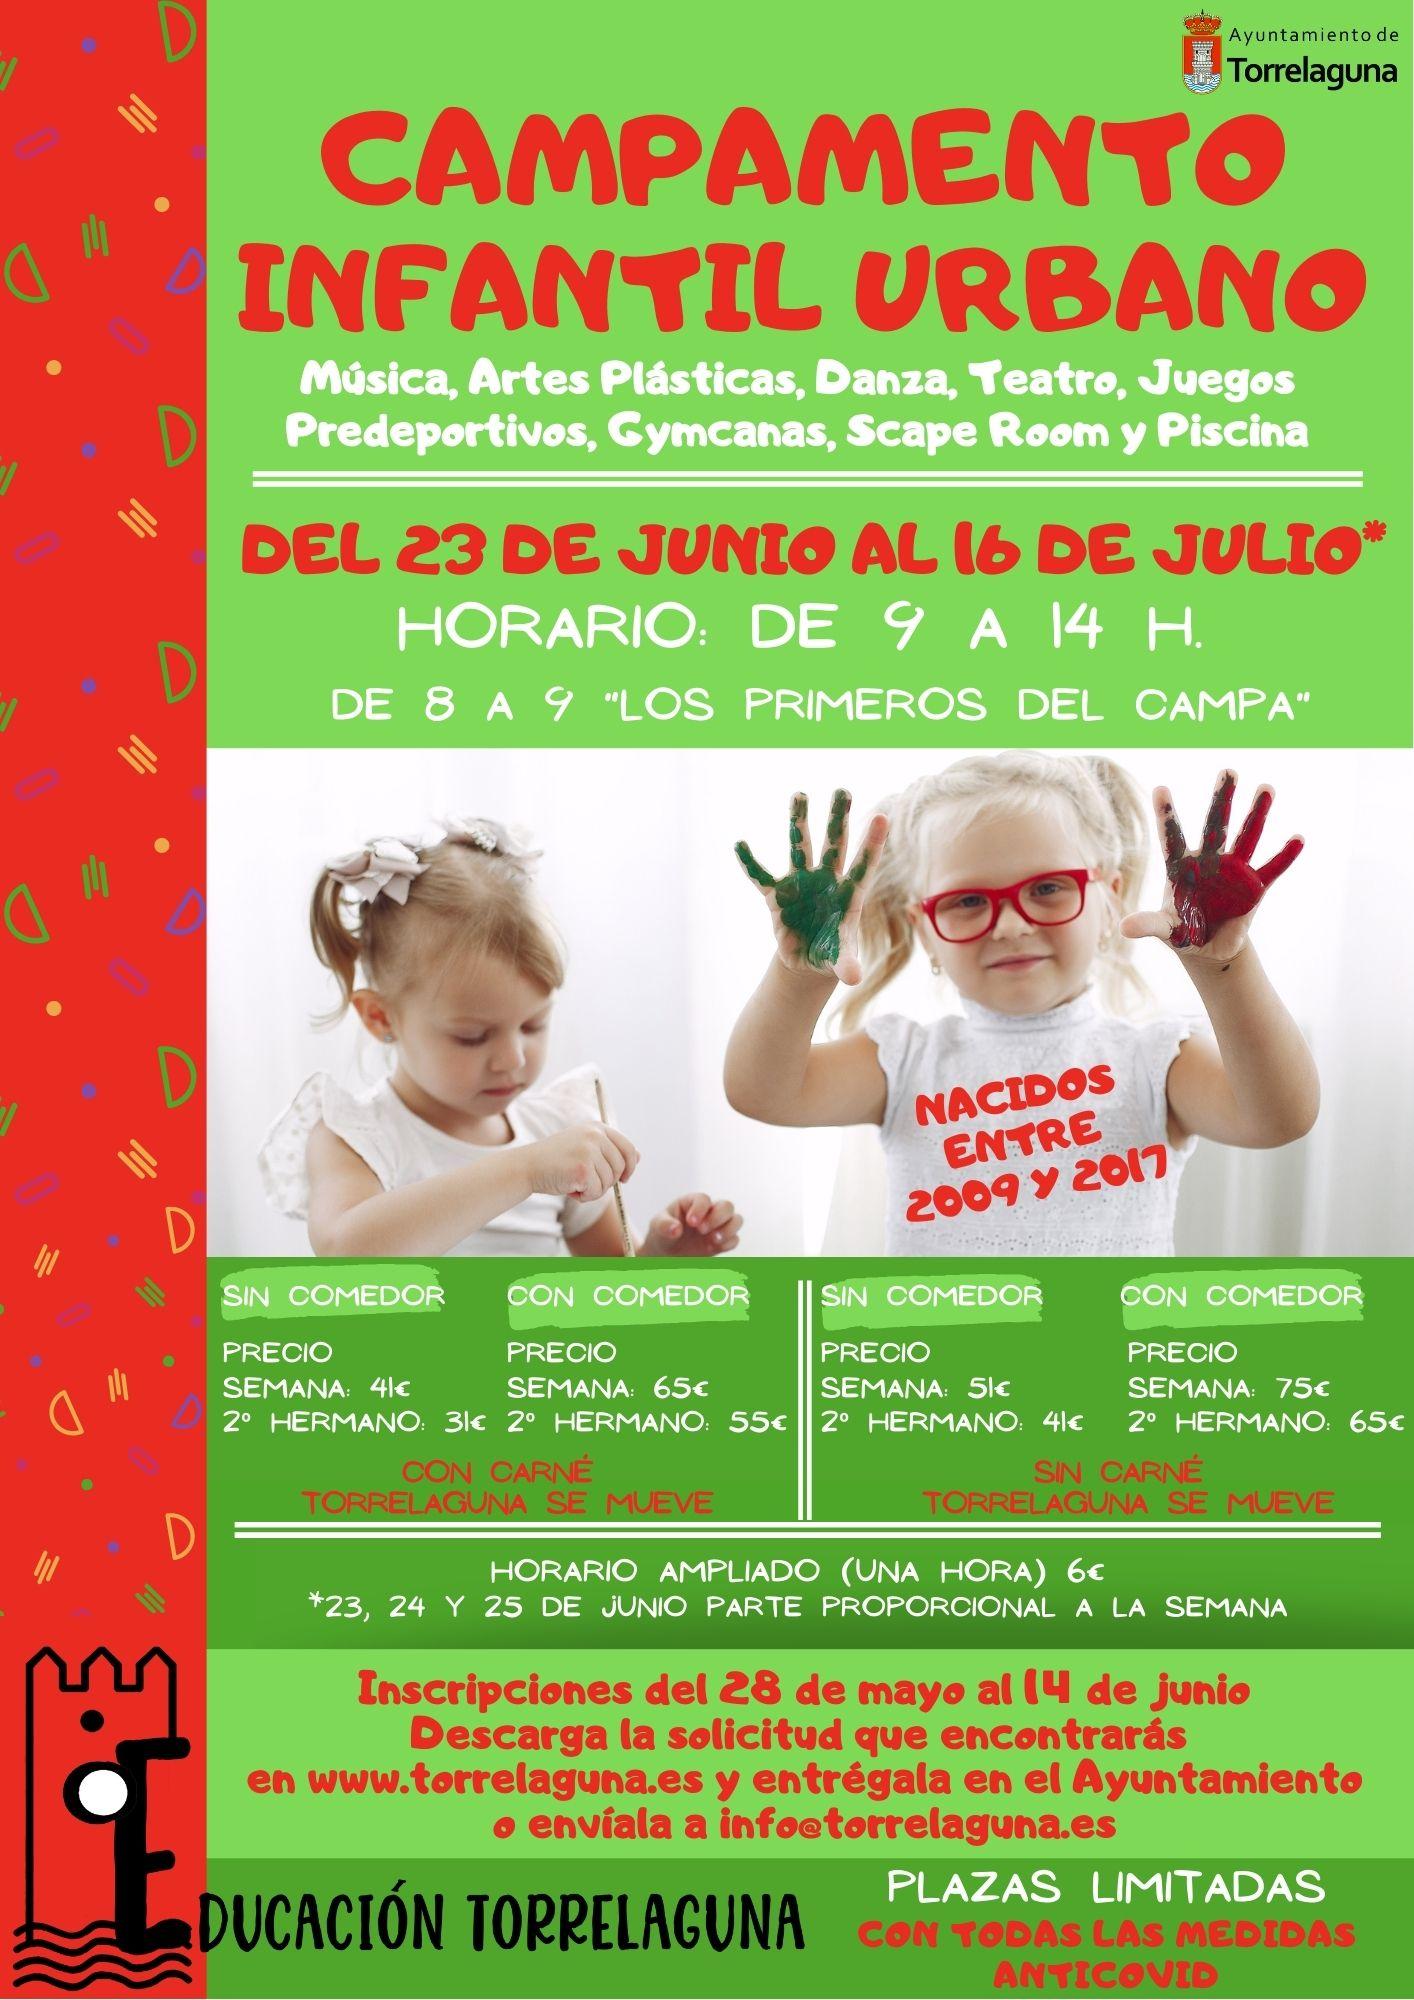 Campamento infantil urbano en Torrelaguna